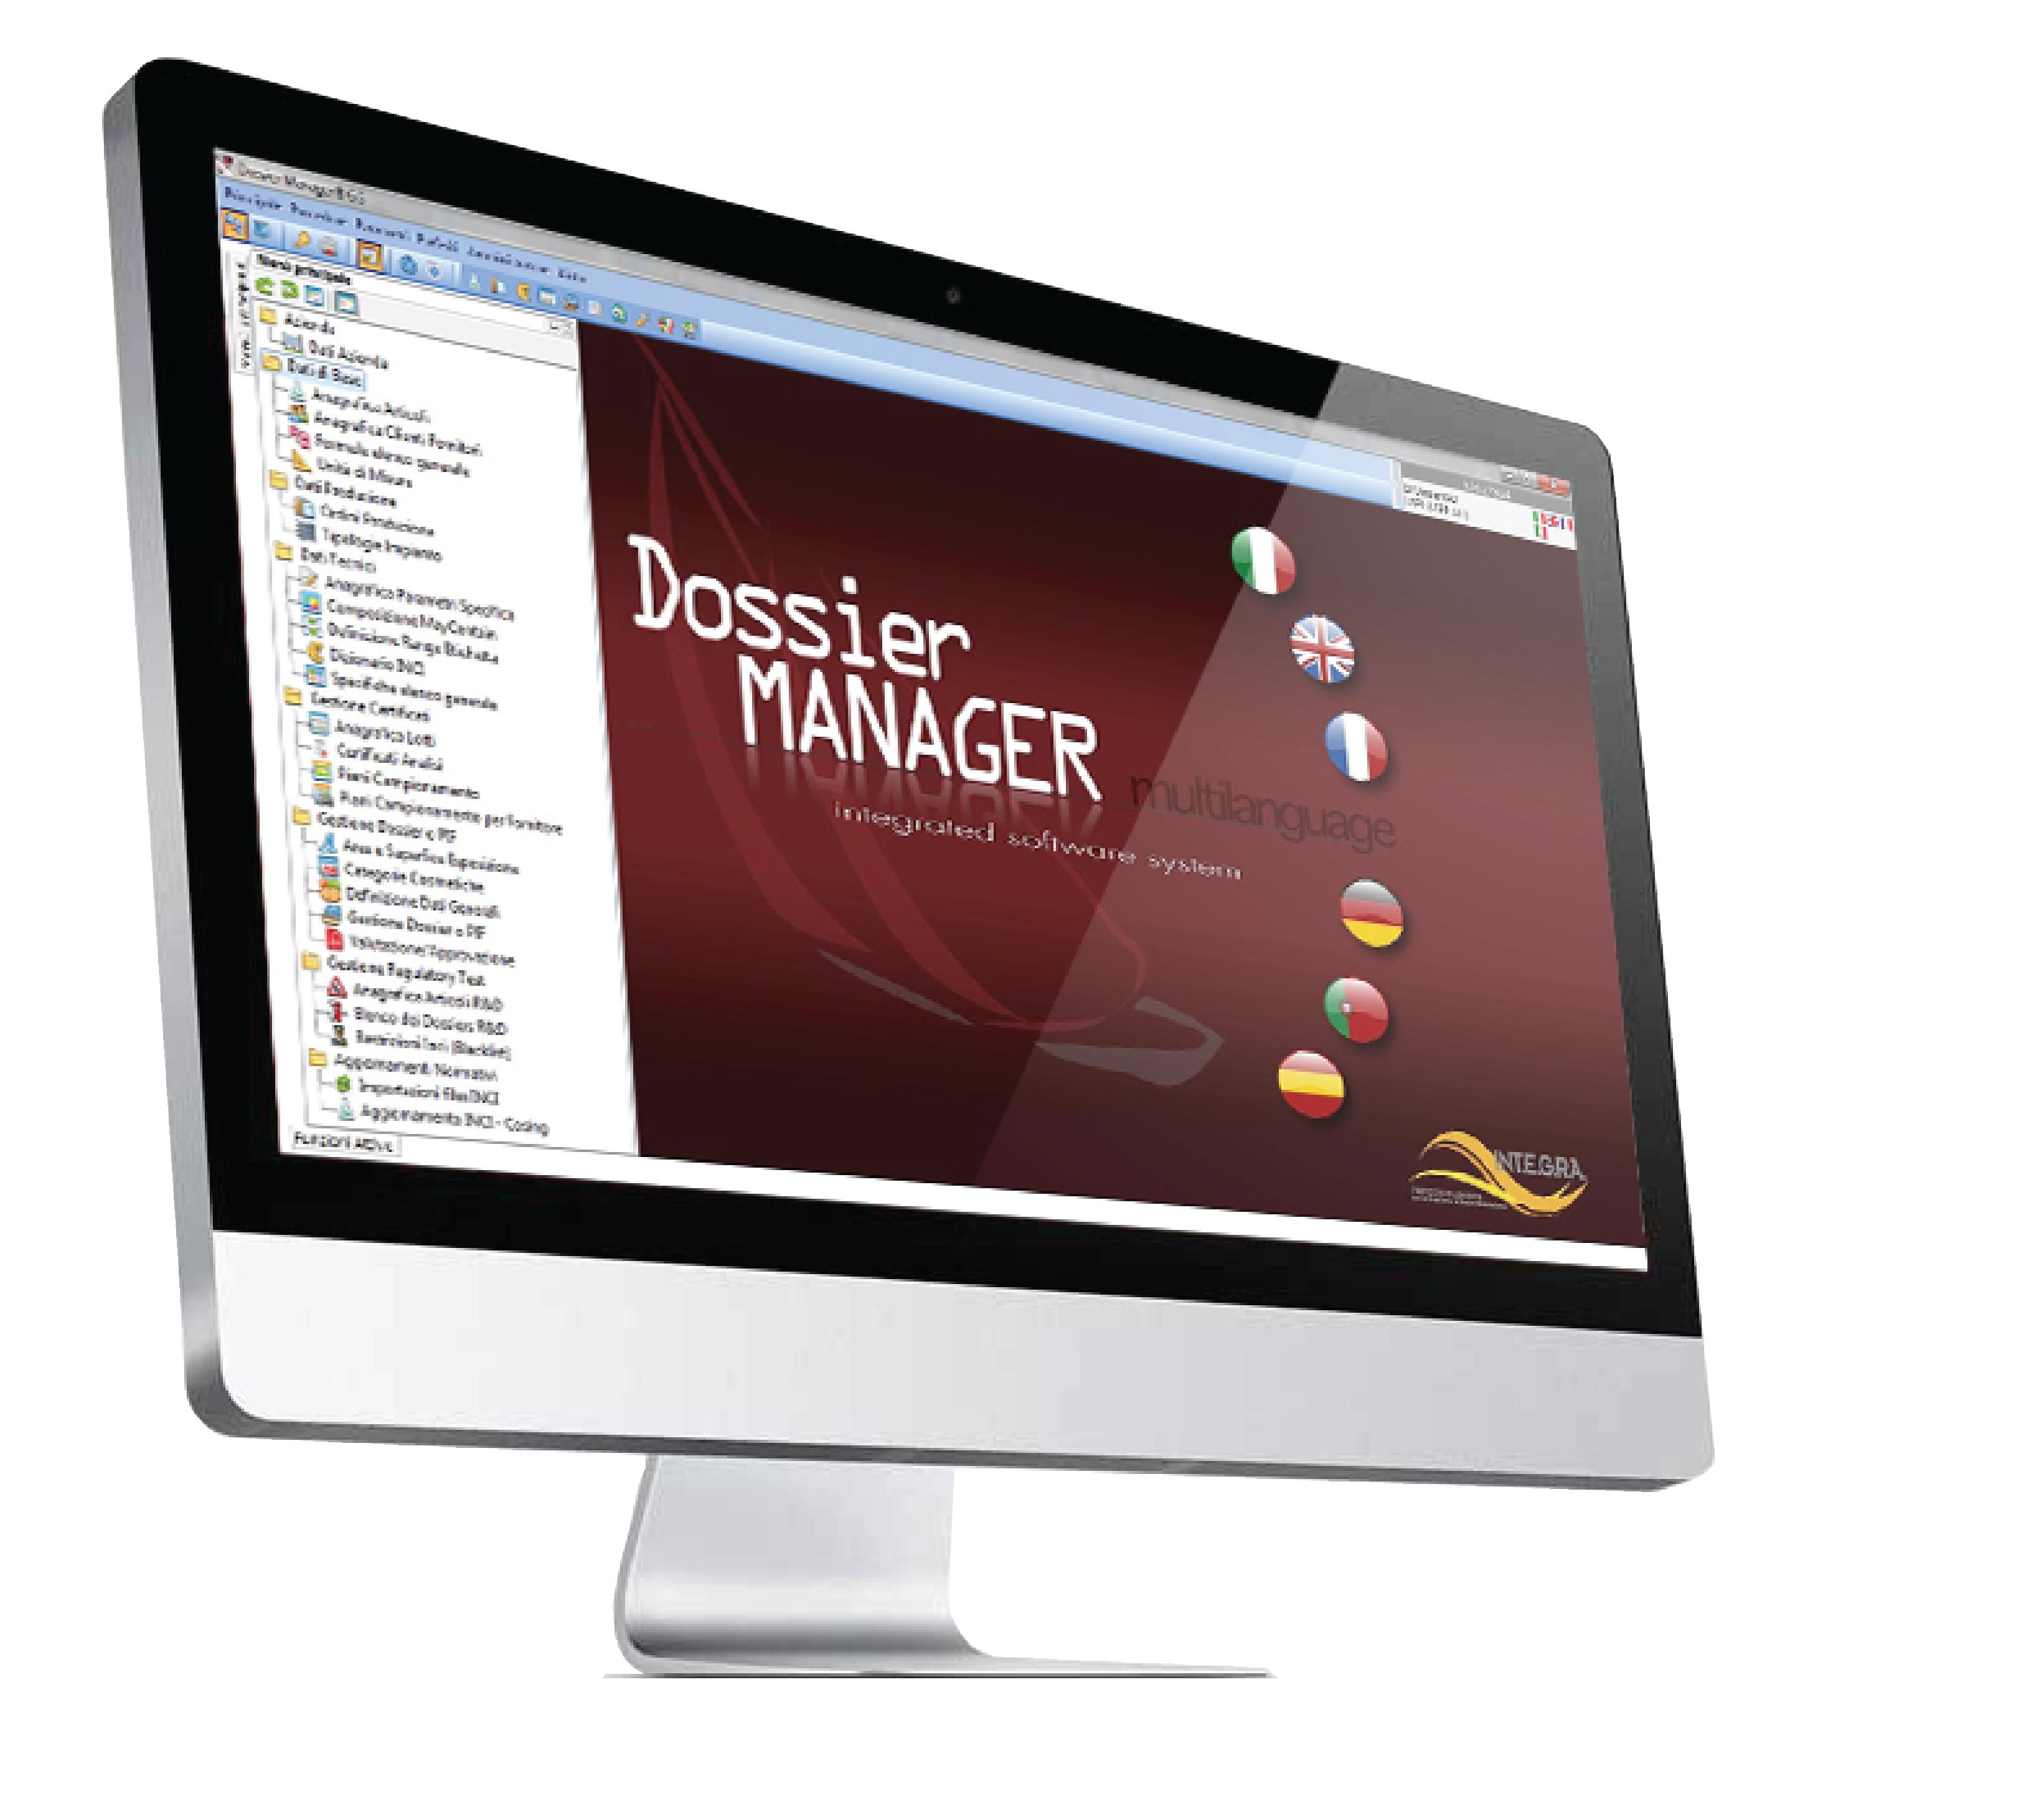 Display Dossier Manager in Schermo